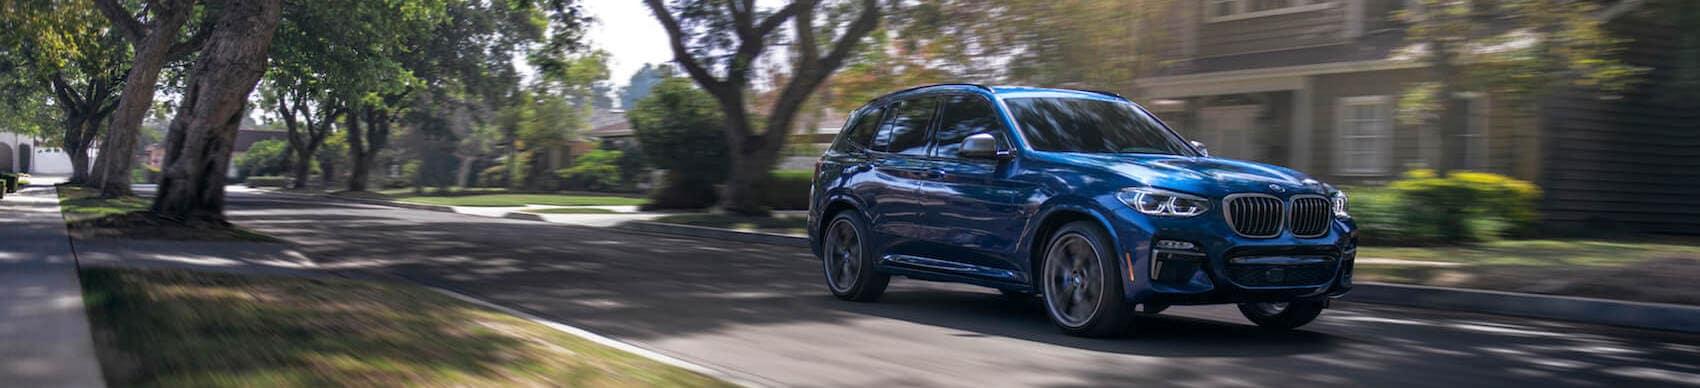 BMW X3 vs Mercedes-Benz GLC Pensacola, FL